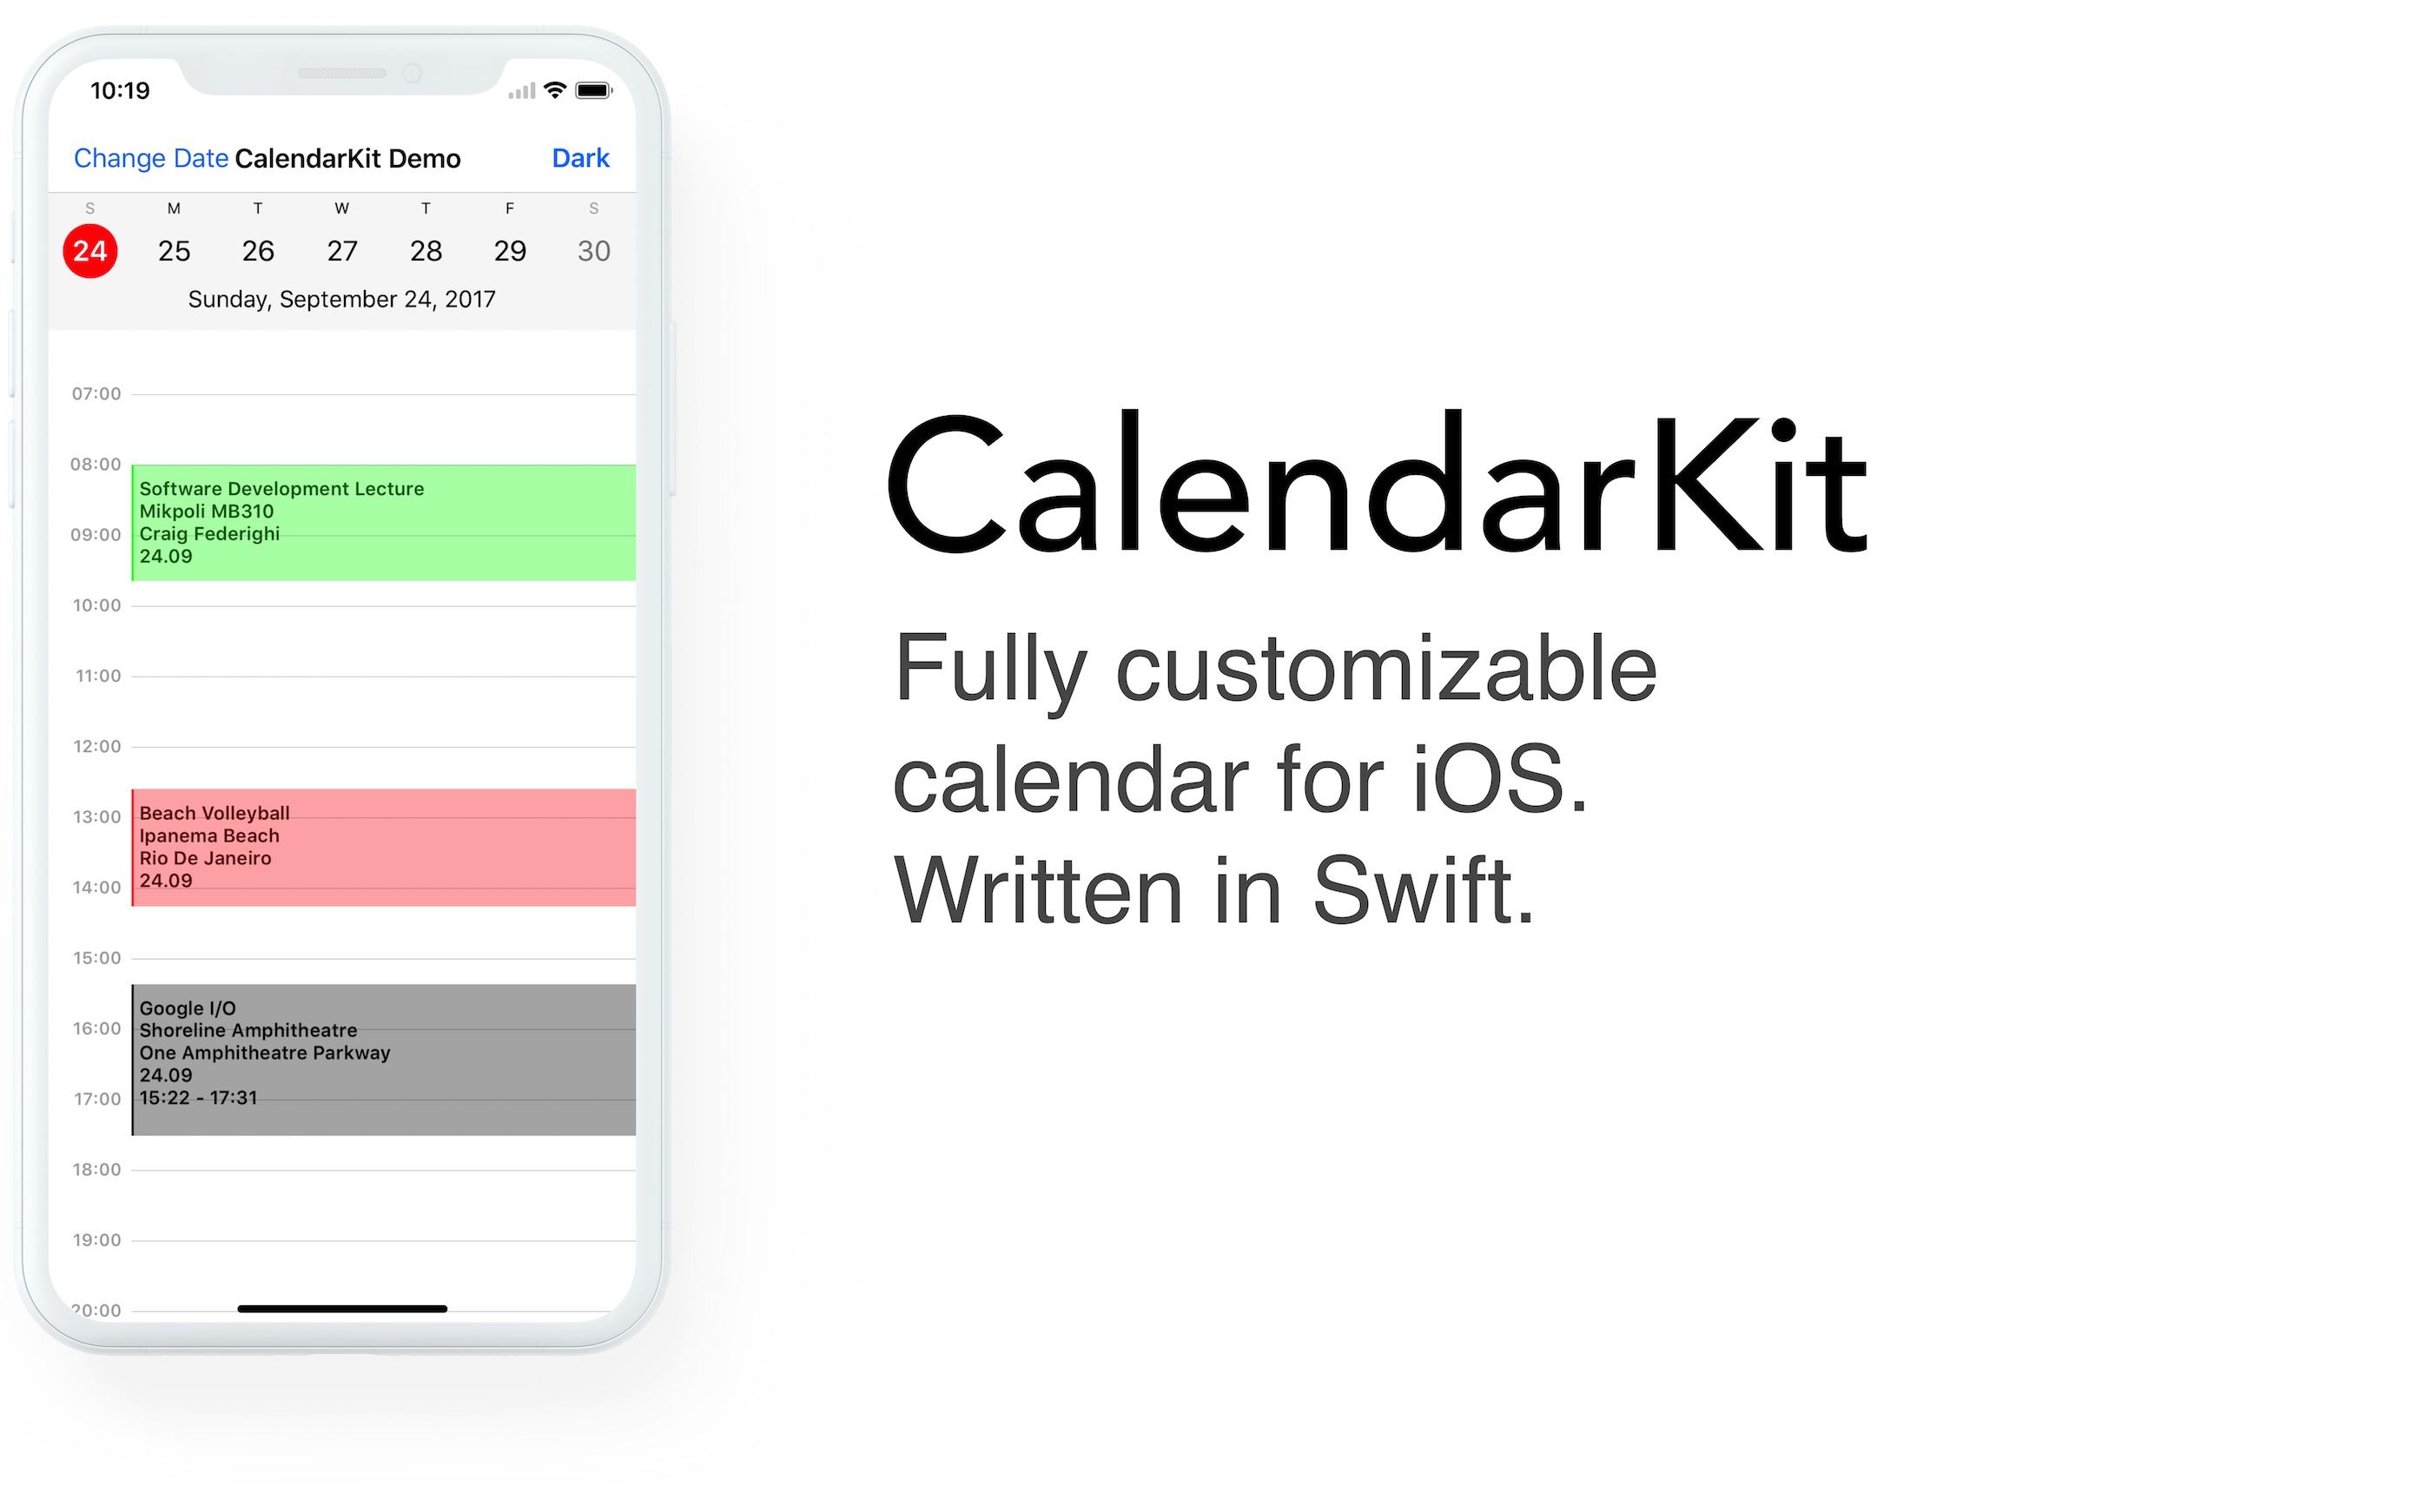 CalendarKit